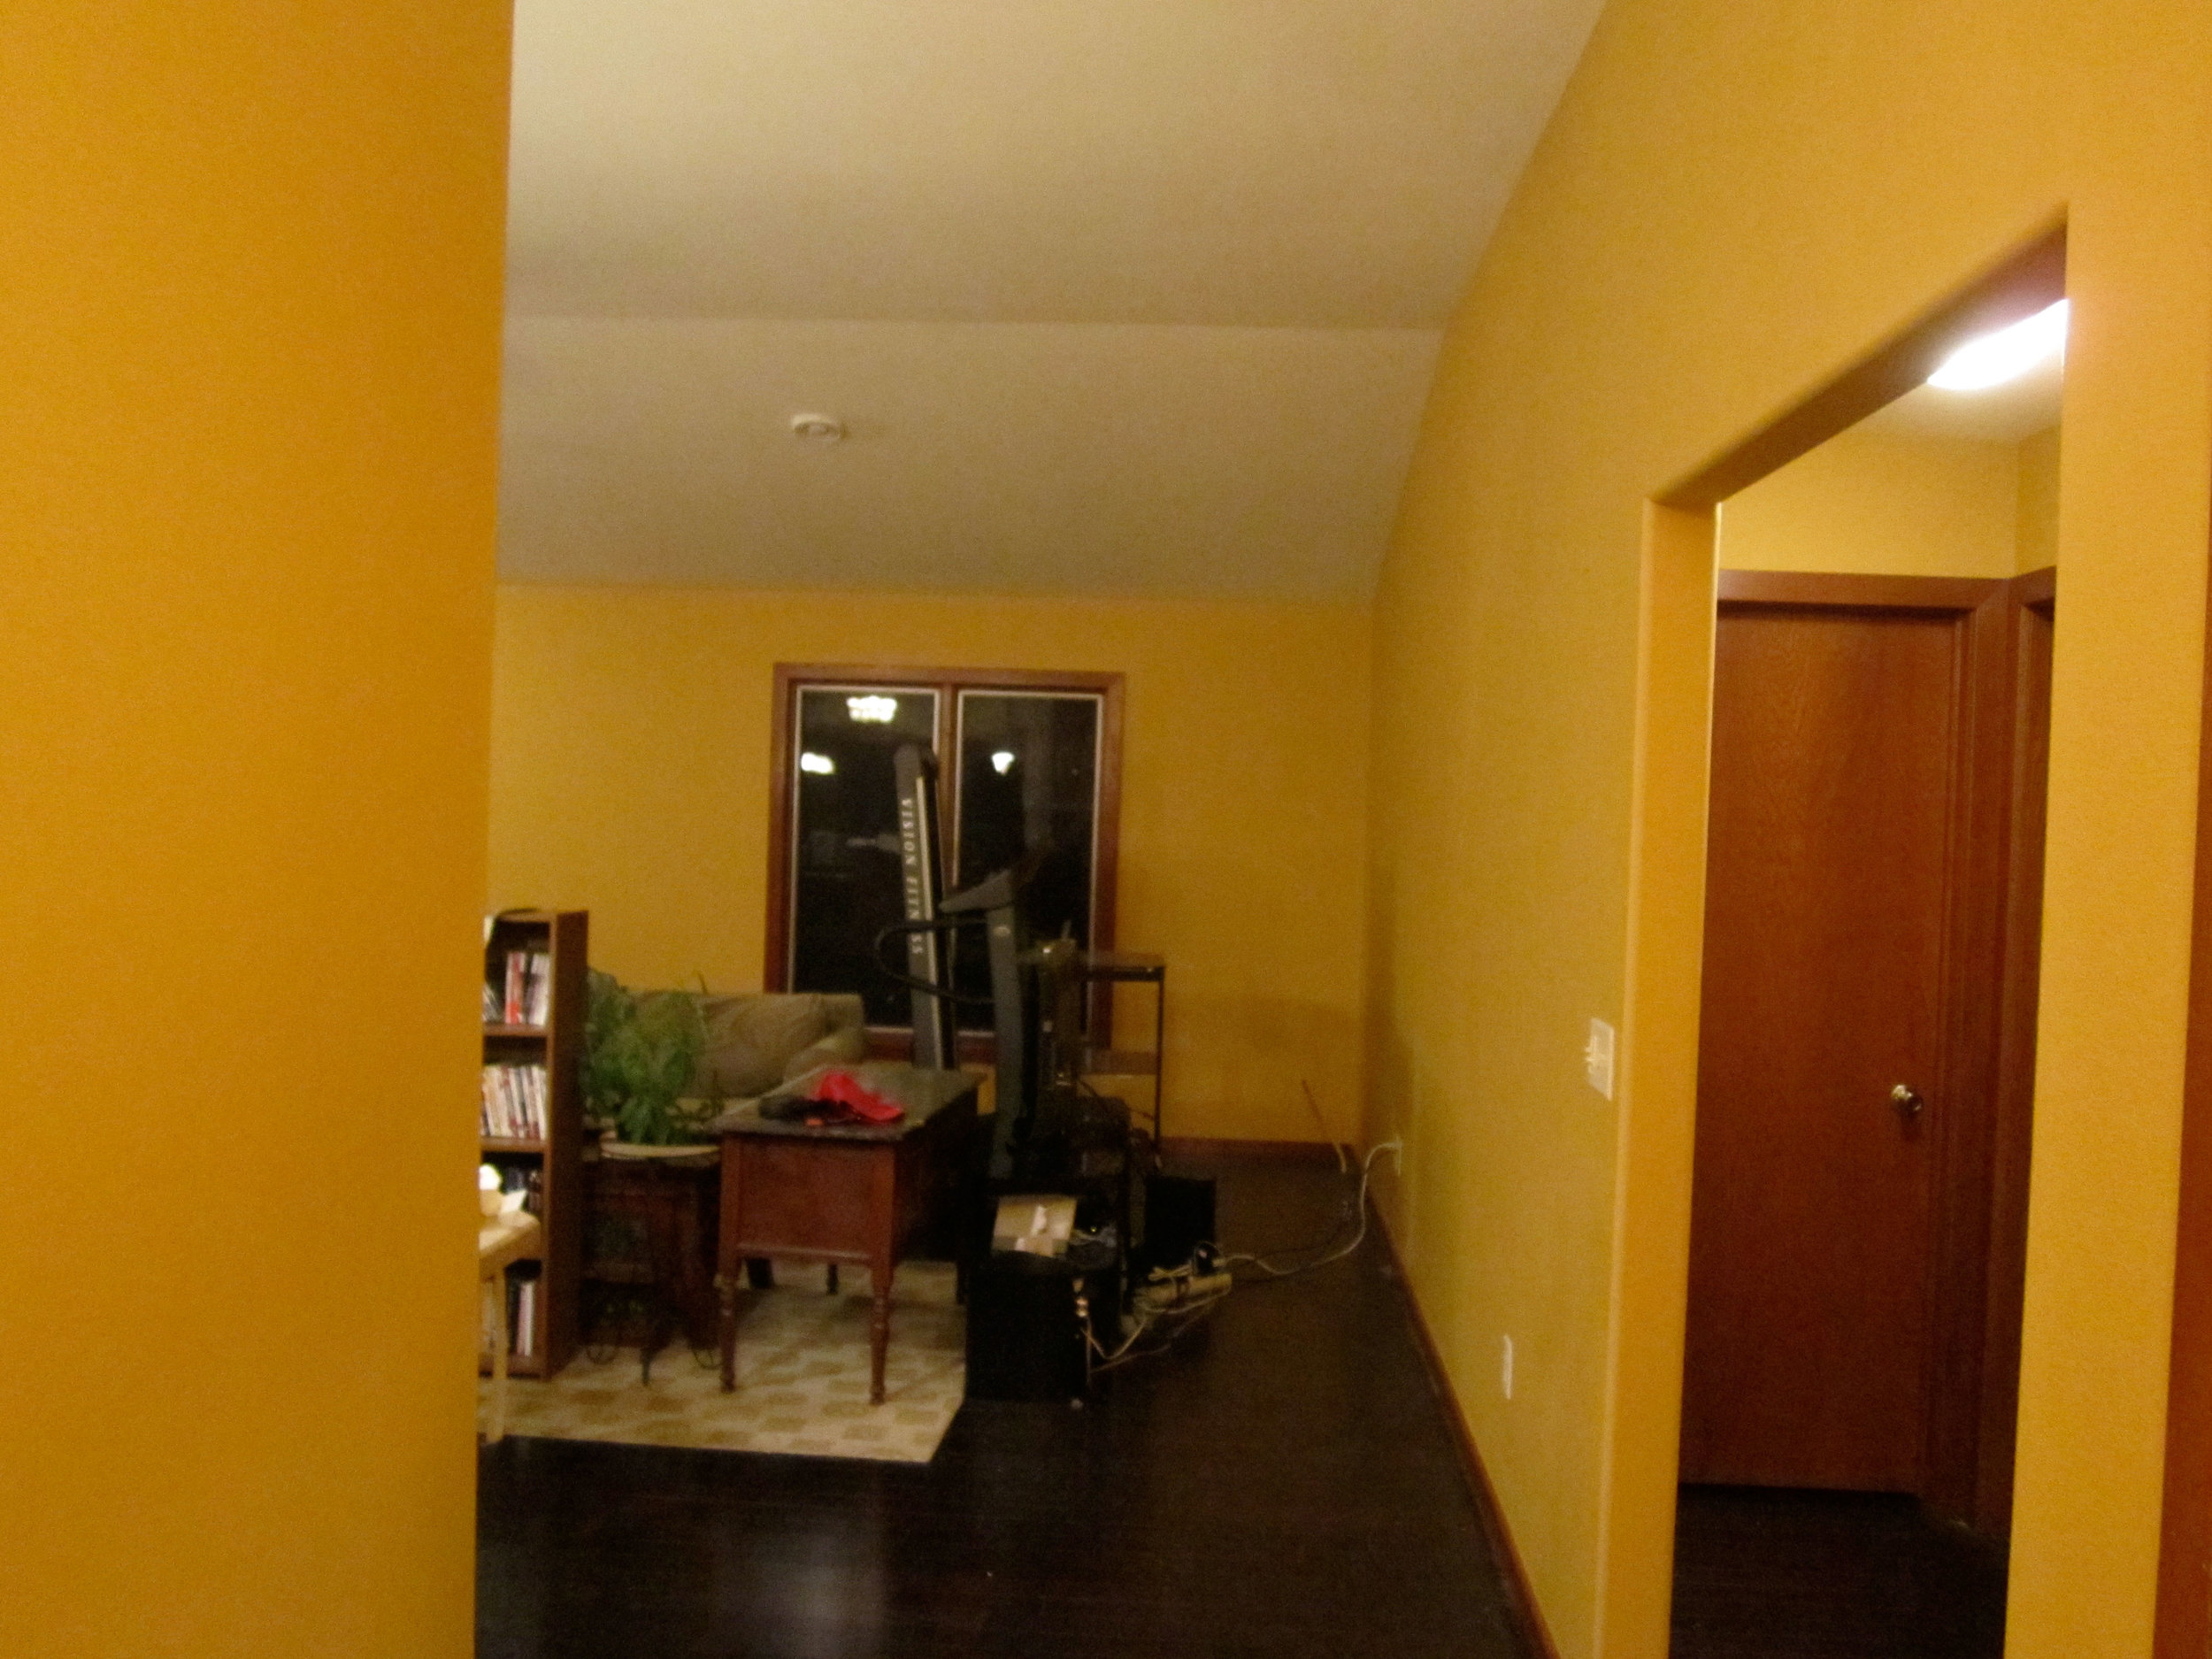 madison-painter-house-for-sale.jpg